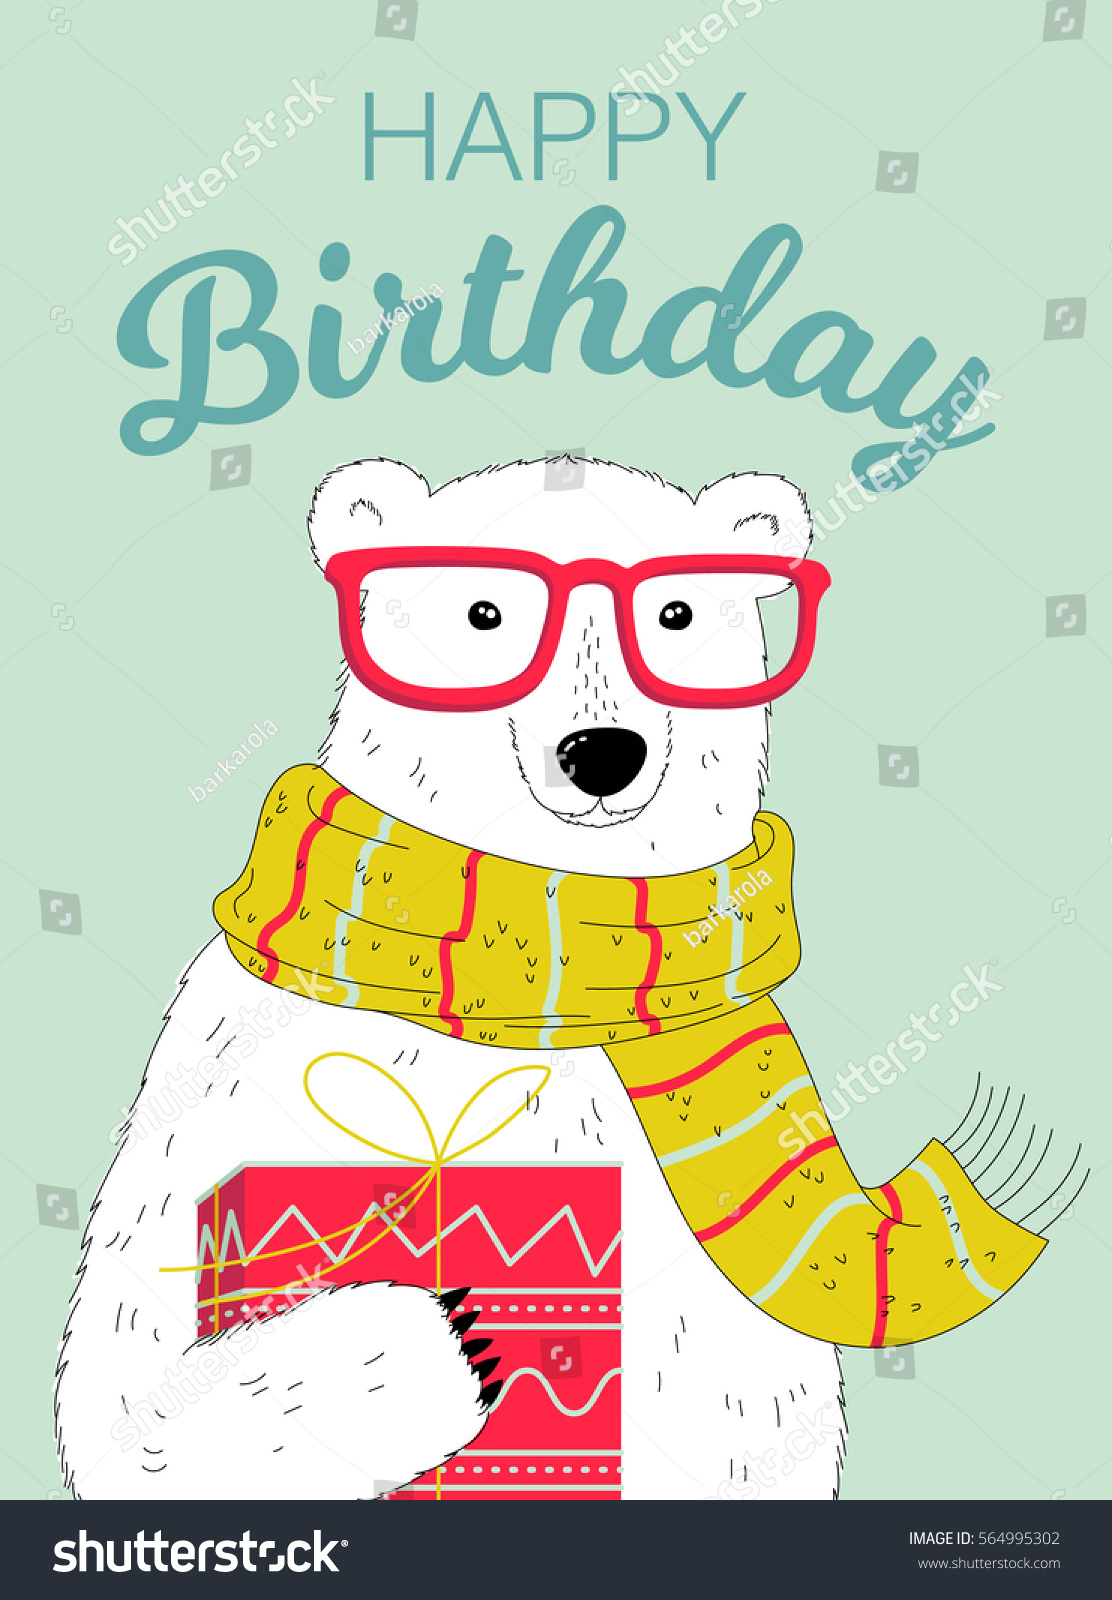 Image Result For Shutterstock Happy Birthday